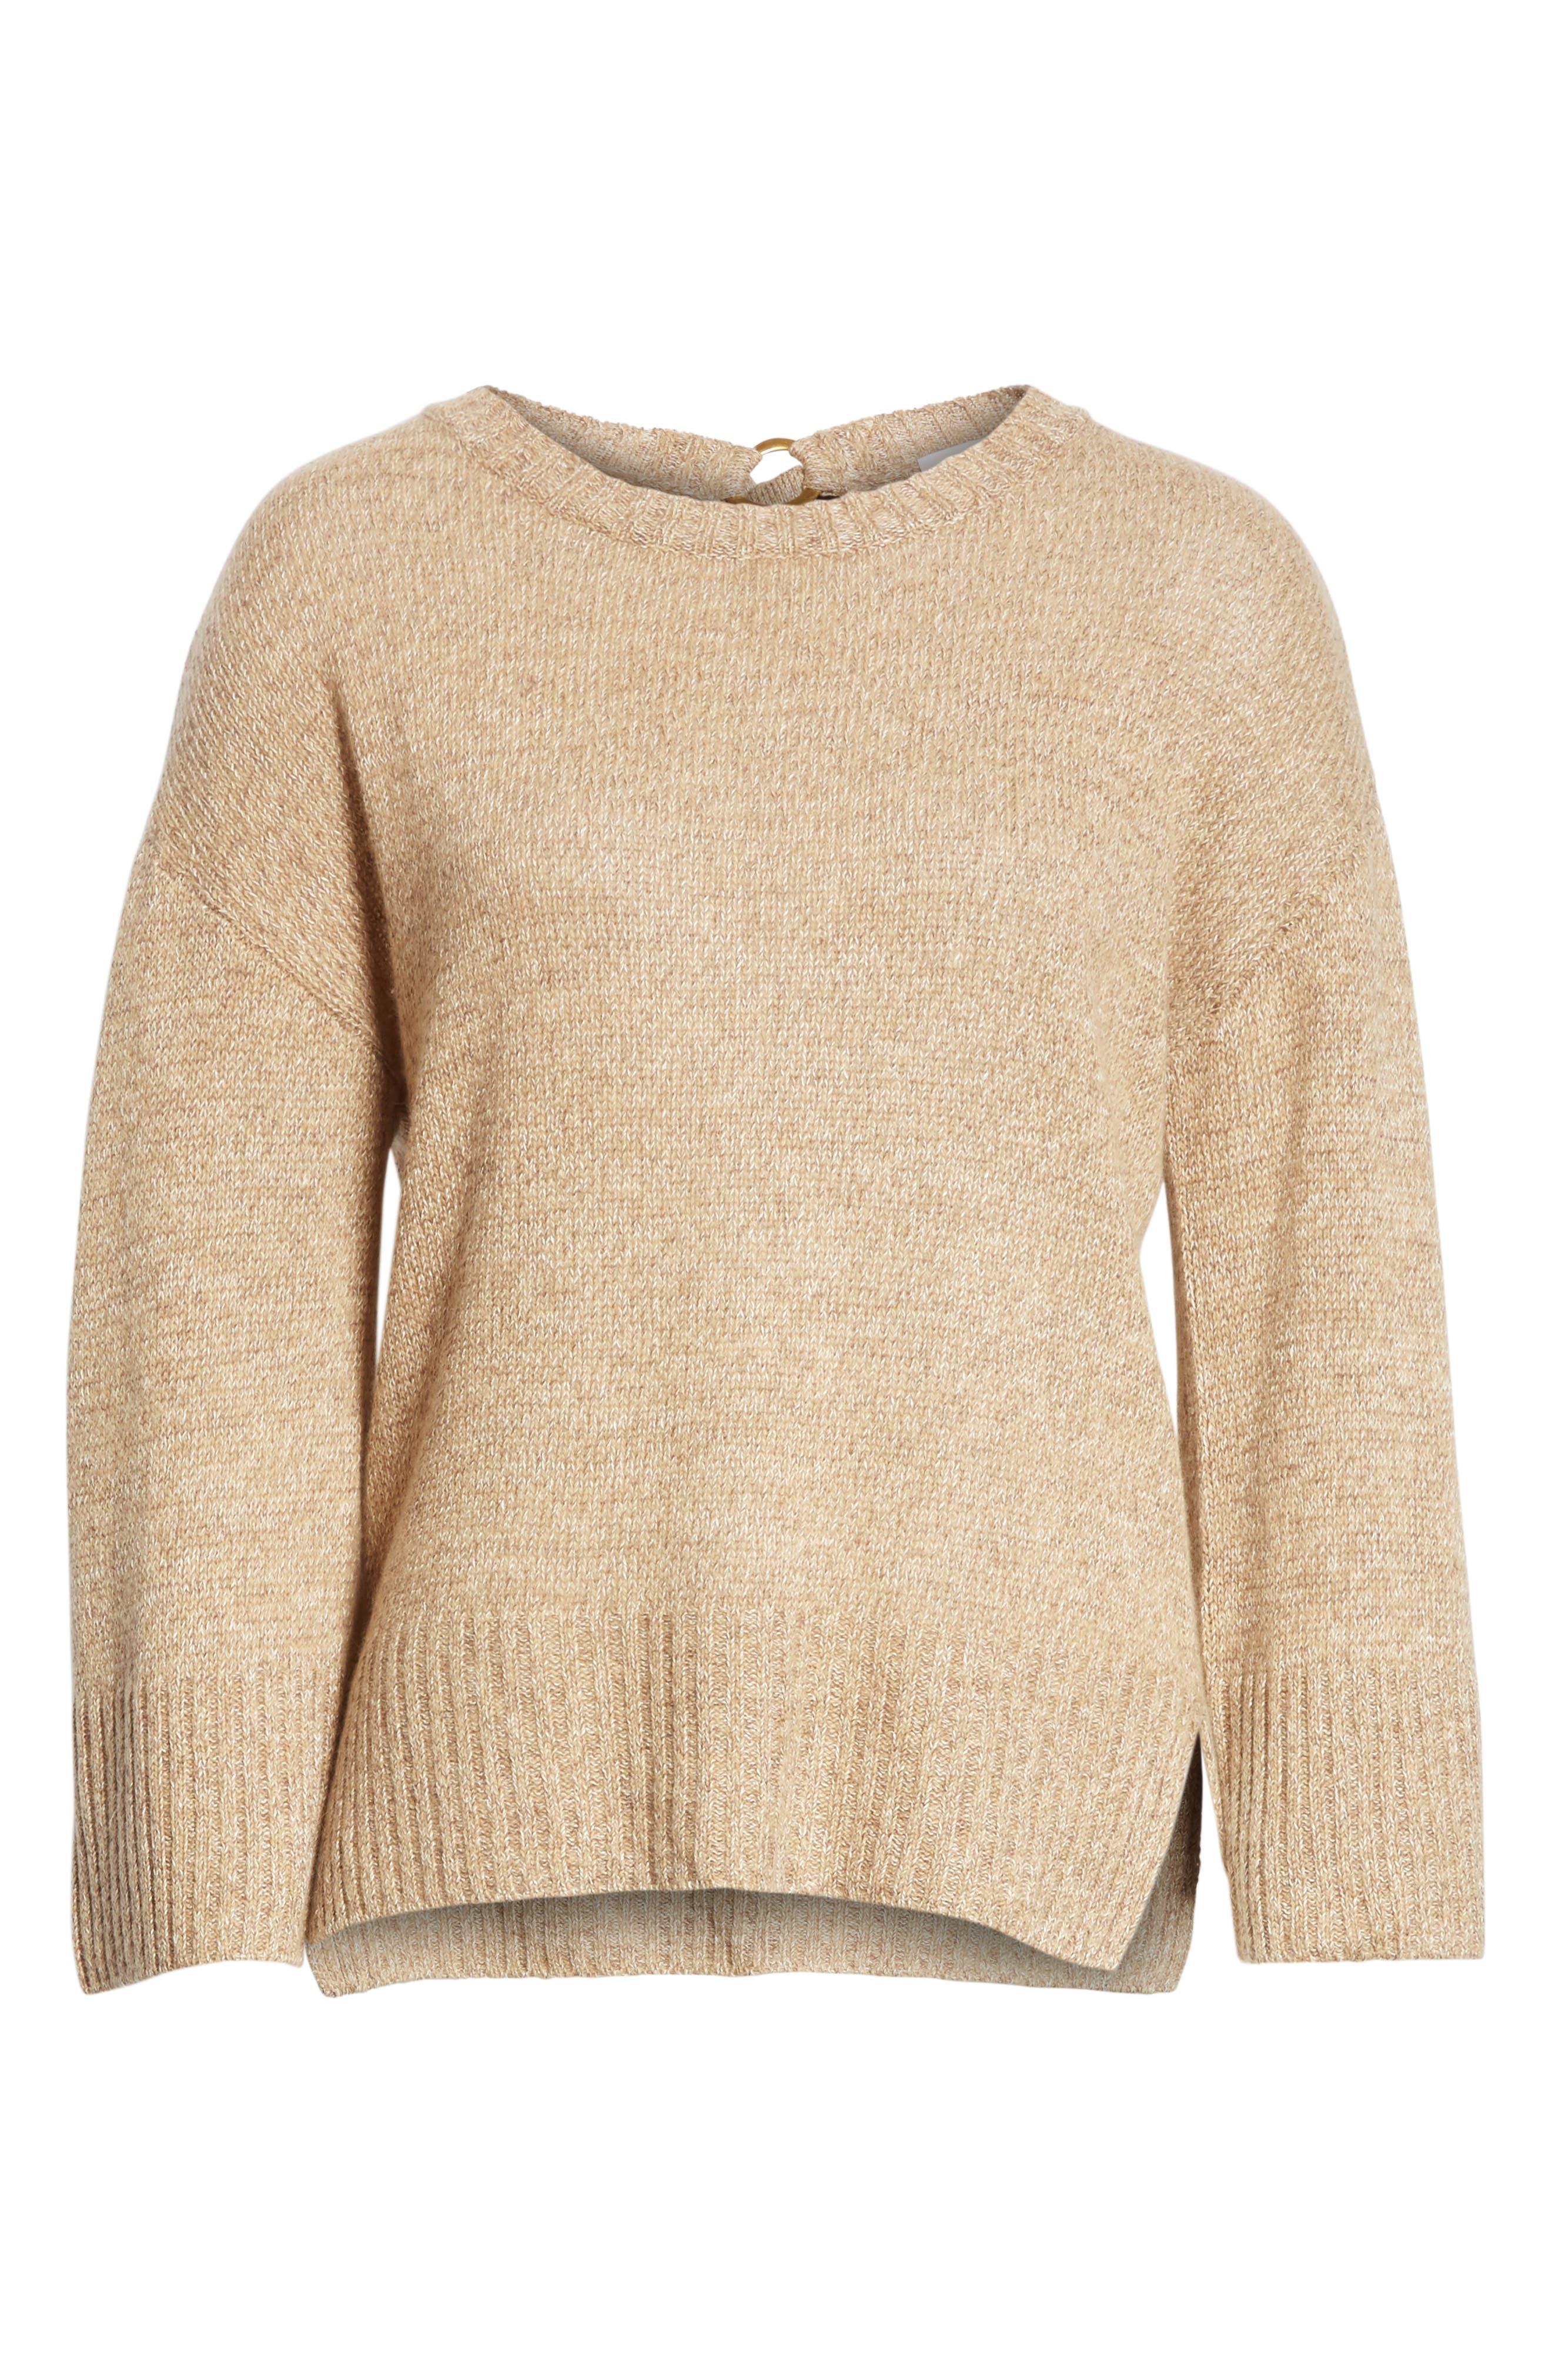 Keyhole Back Sweater,                             Alternate thumbnail 6, color,                             263